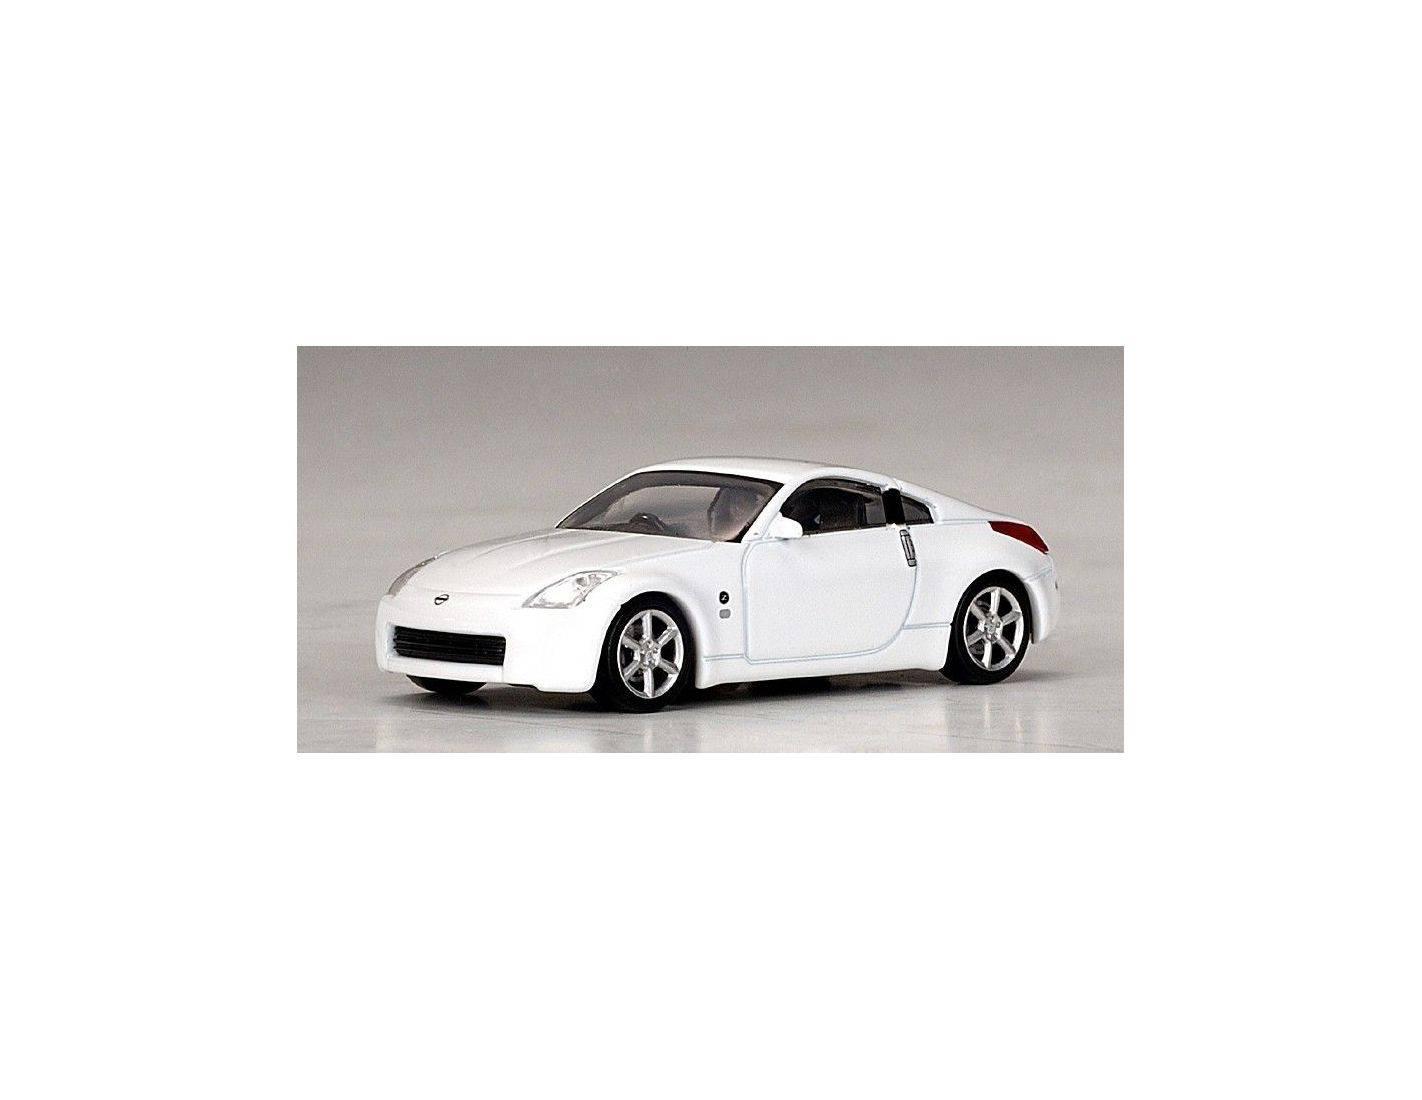 Auto Art / Gateway 20283 NISSAN FAIRLADY Z COUPE WHITE 1/64 Modellino